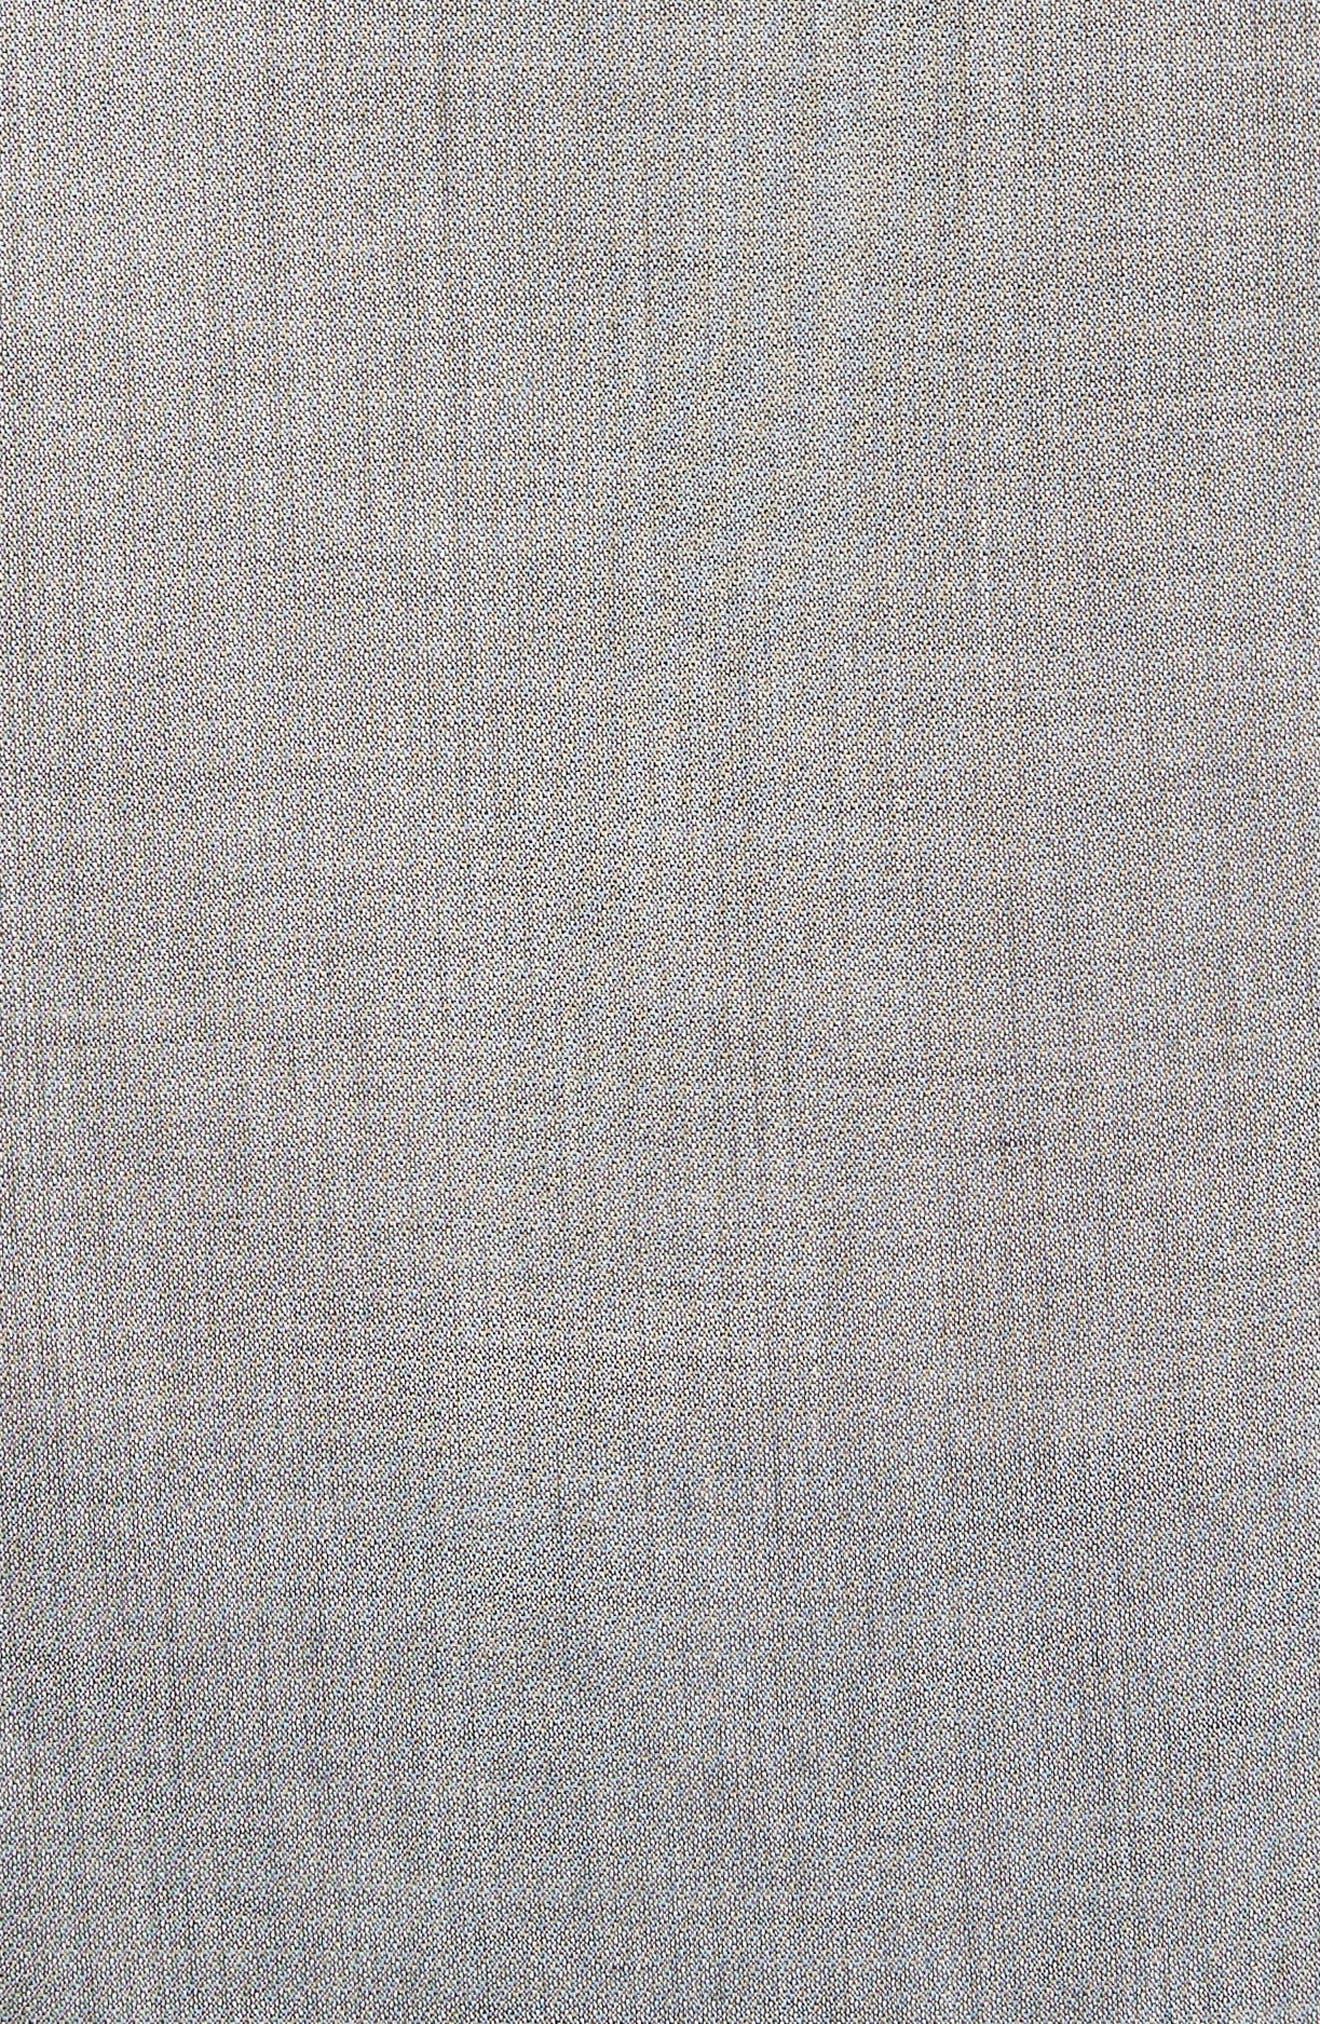 Slim Fit Roller Long Sleeve Shirt,                             Alternate thumbnail 5, color,                             Grey Hthr